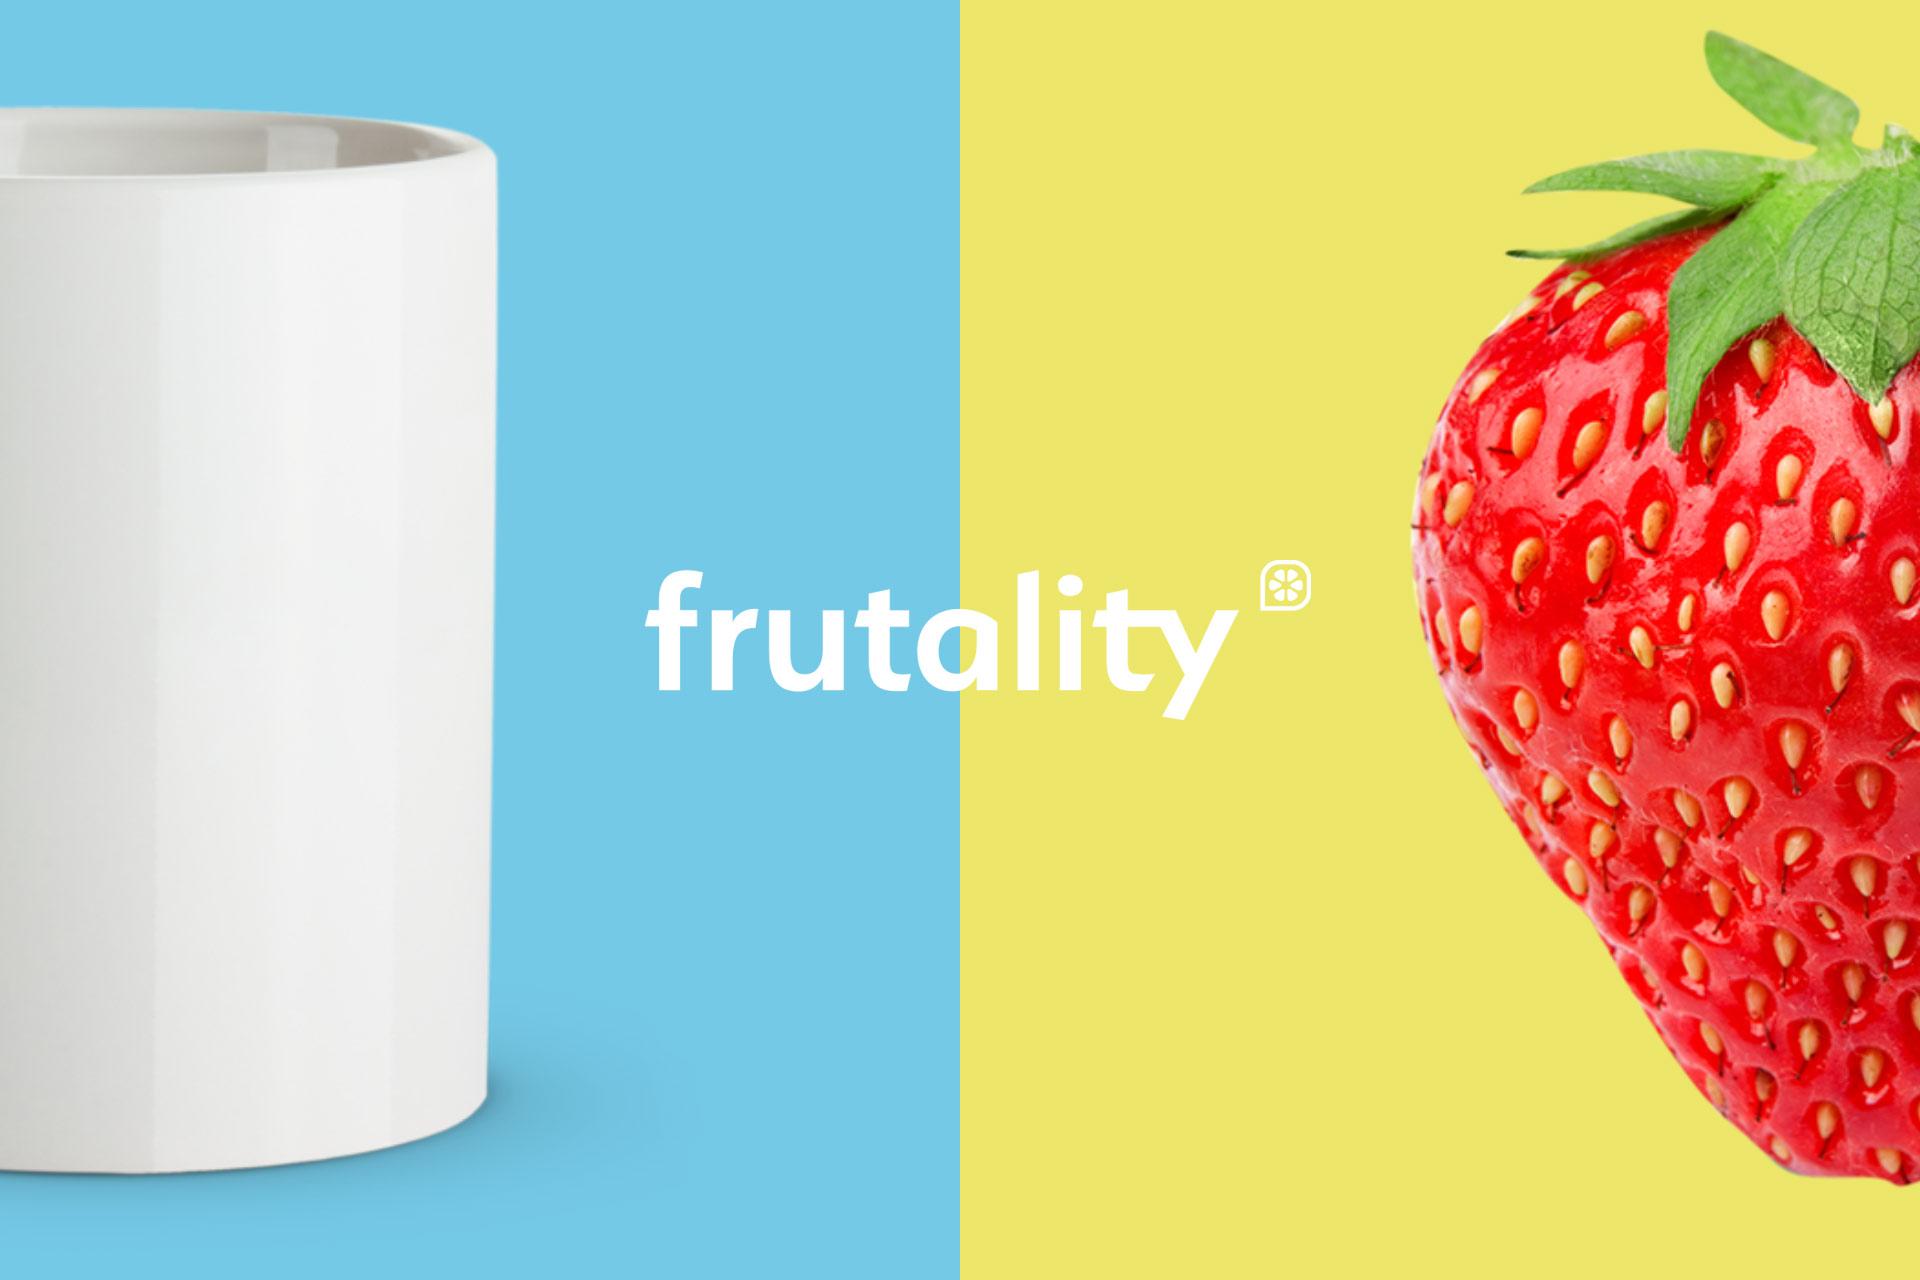 Branding e identidad corporativa Frutality, 2019